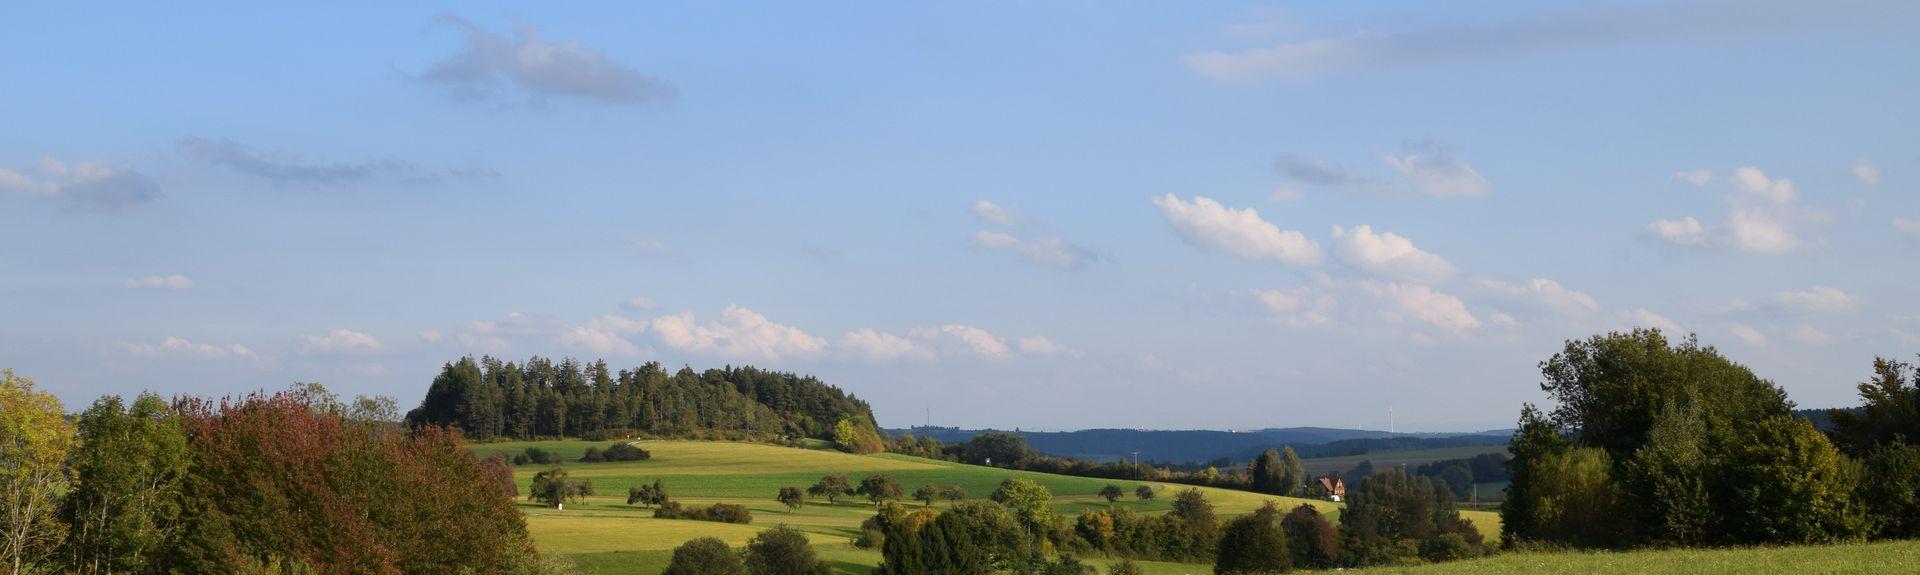 Pfalzgrafenweiler, Germany